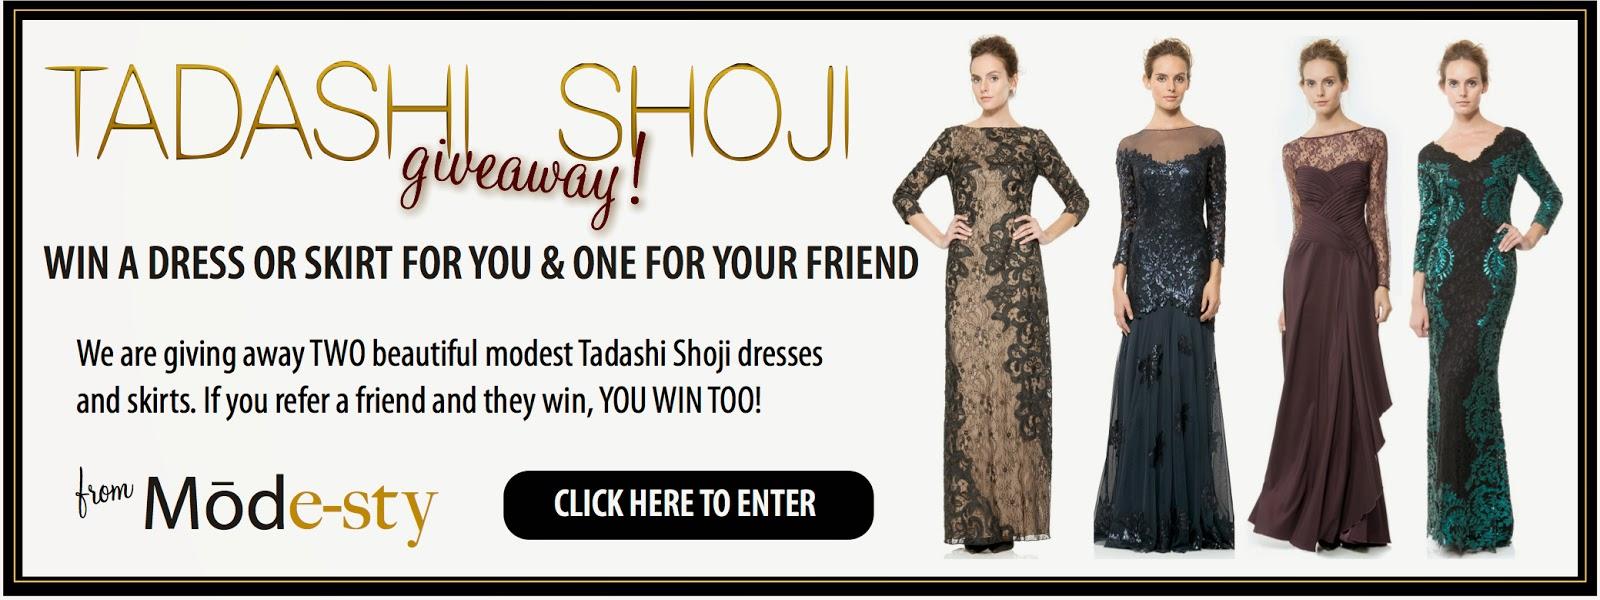 win long sleeve evening gown modest formal wear designer dress by Tadashi Shoji hijab tznius fashion style giveaway